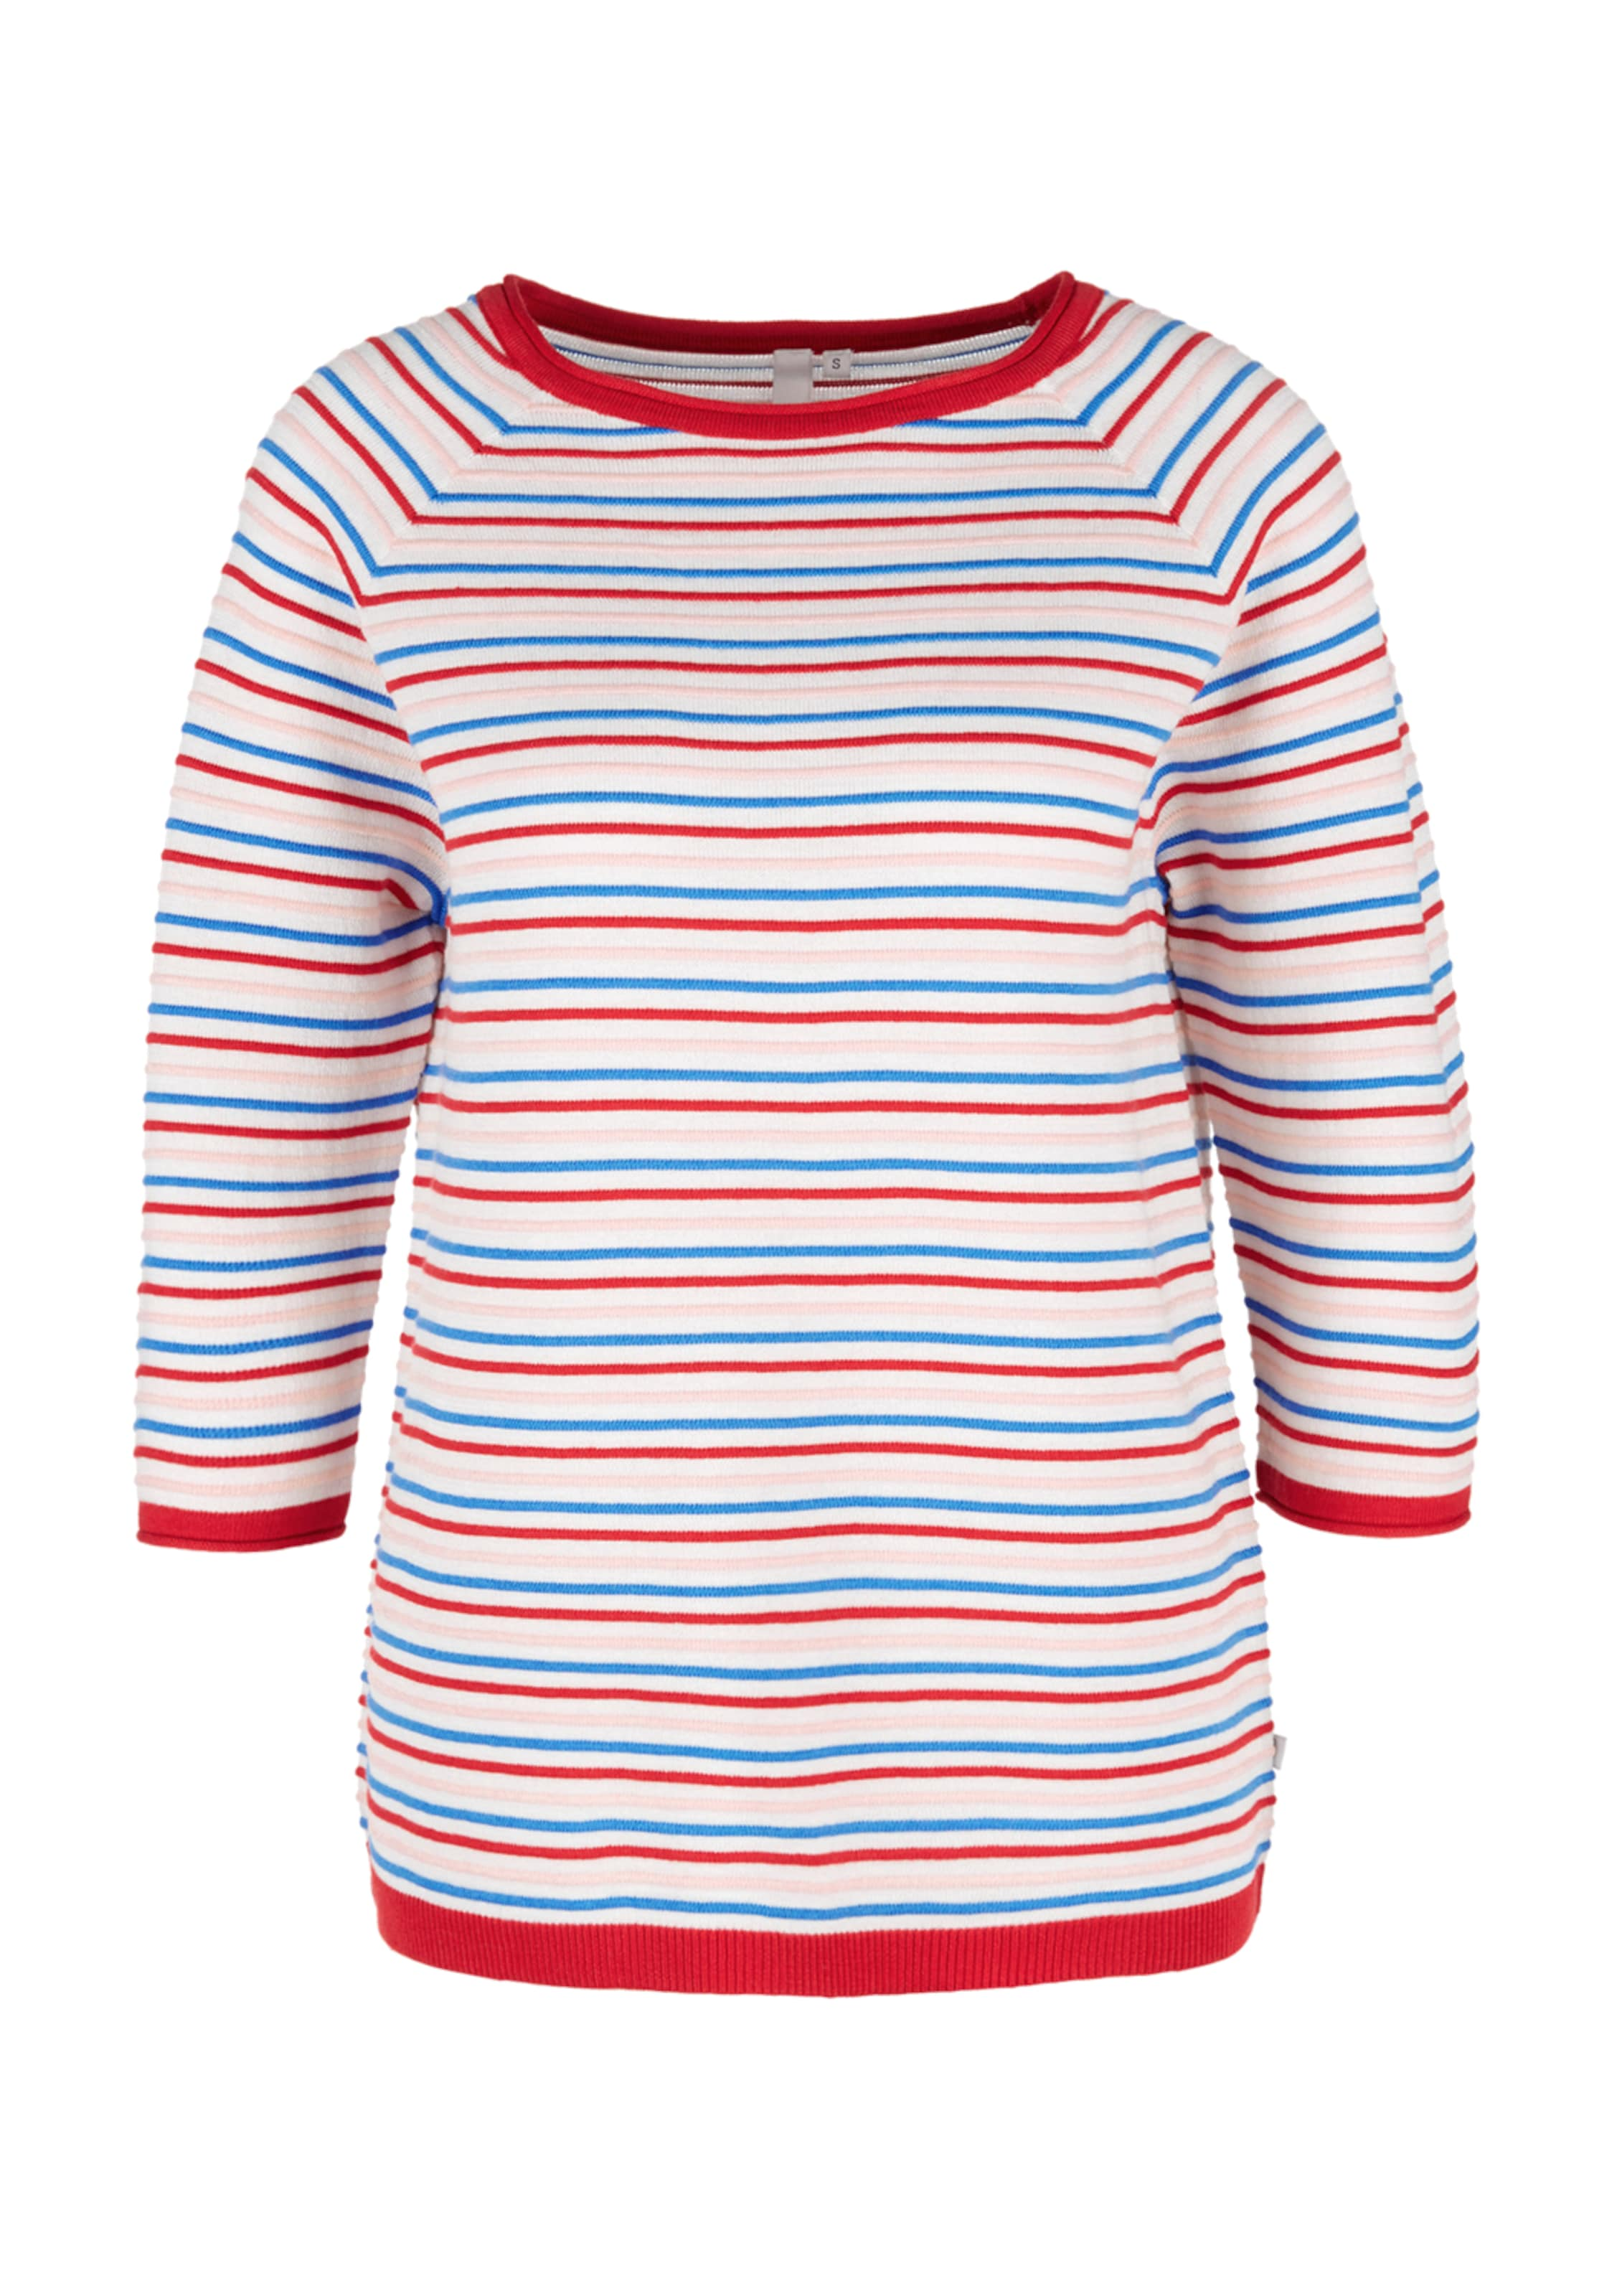 s Designed HellblauAltrosa Weiß Rot Q In Pullover By FJl15K3uTc